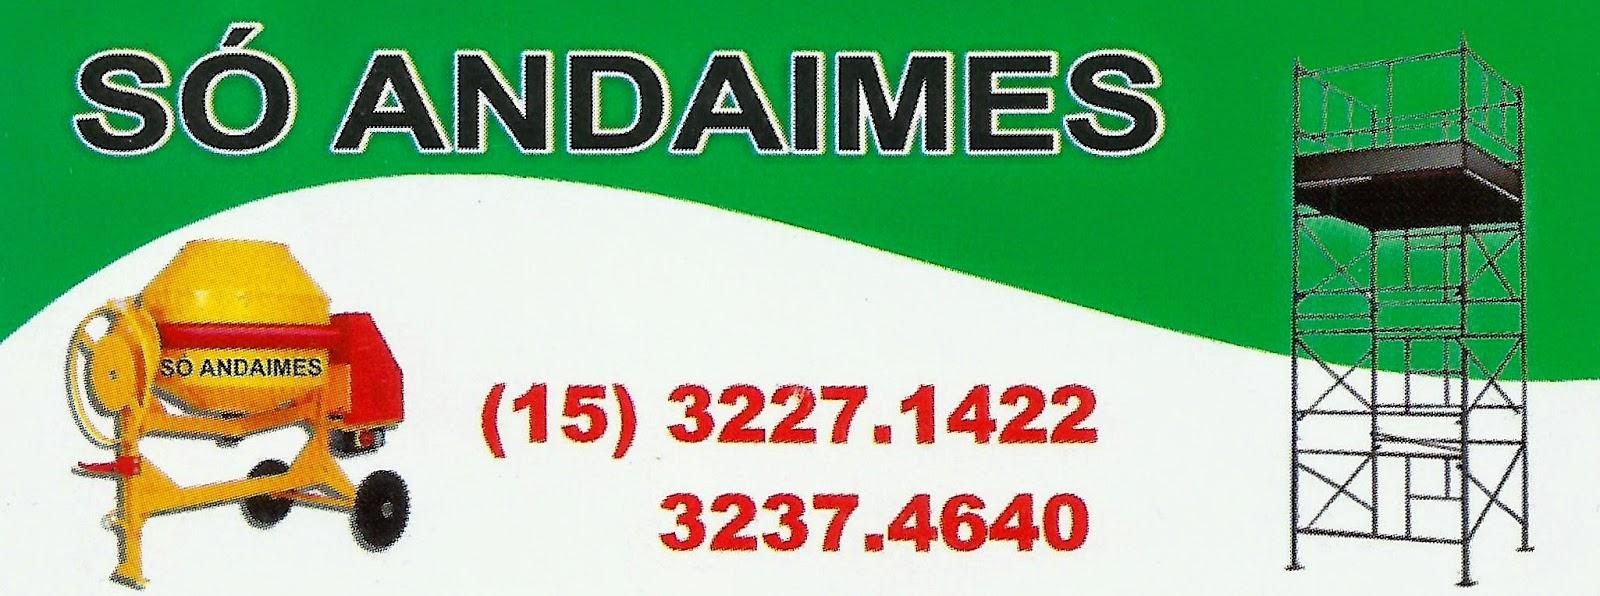 SÓ  ANDAIMES Rua. António Rodrigues Sanches, 150 Jardim do Sol - Sorocaba - SP e-mail: soandaimes@yahoo.com.br tel: (15) 3227-1422 / 3237-4640